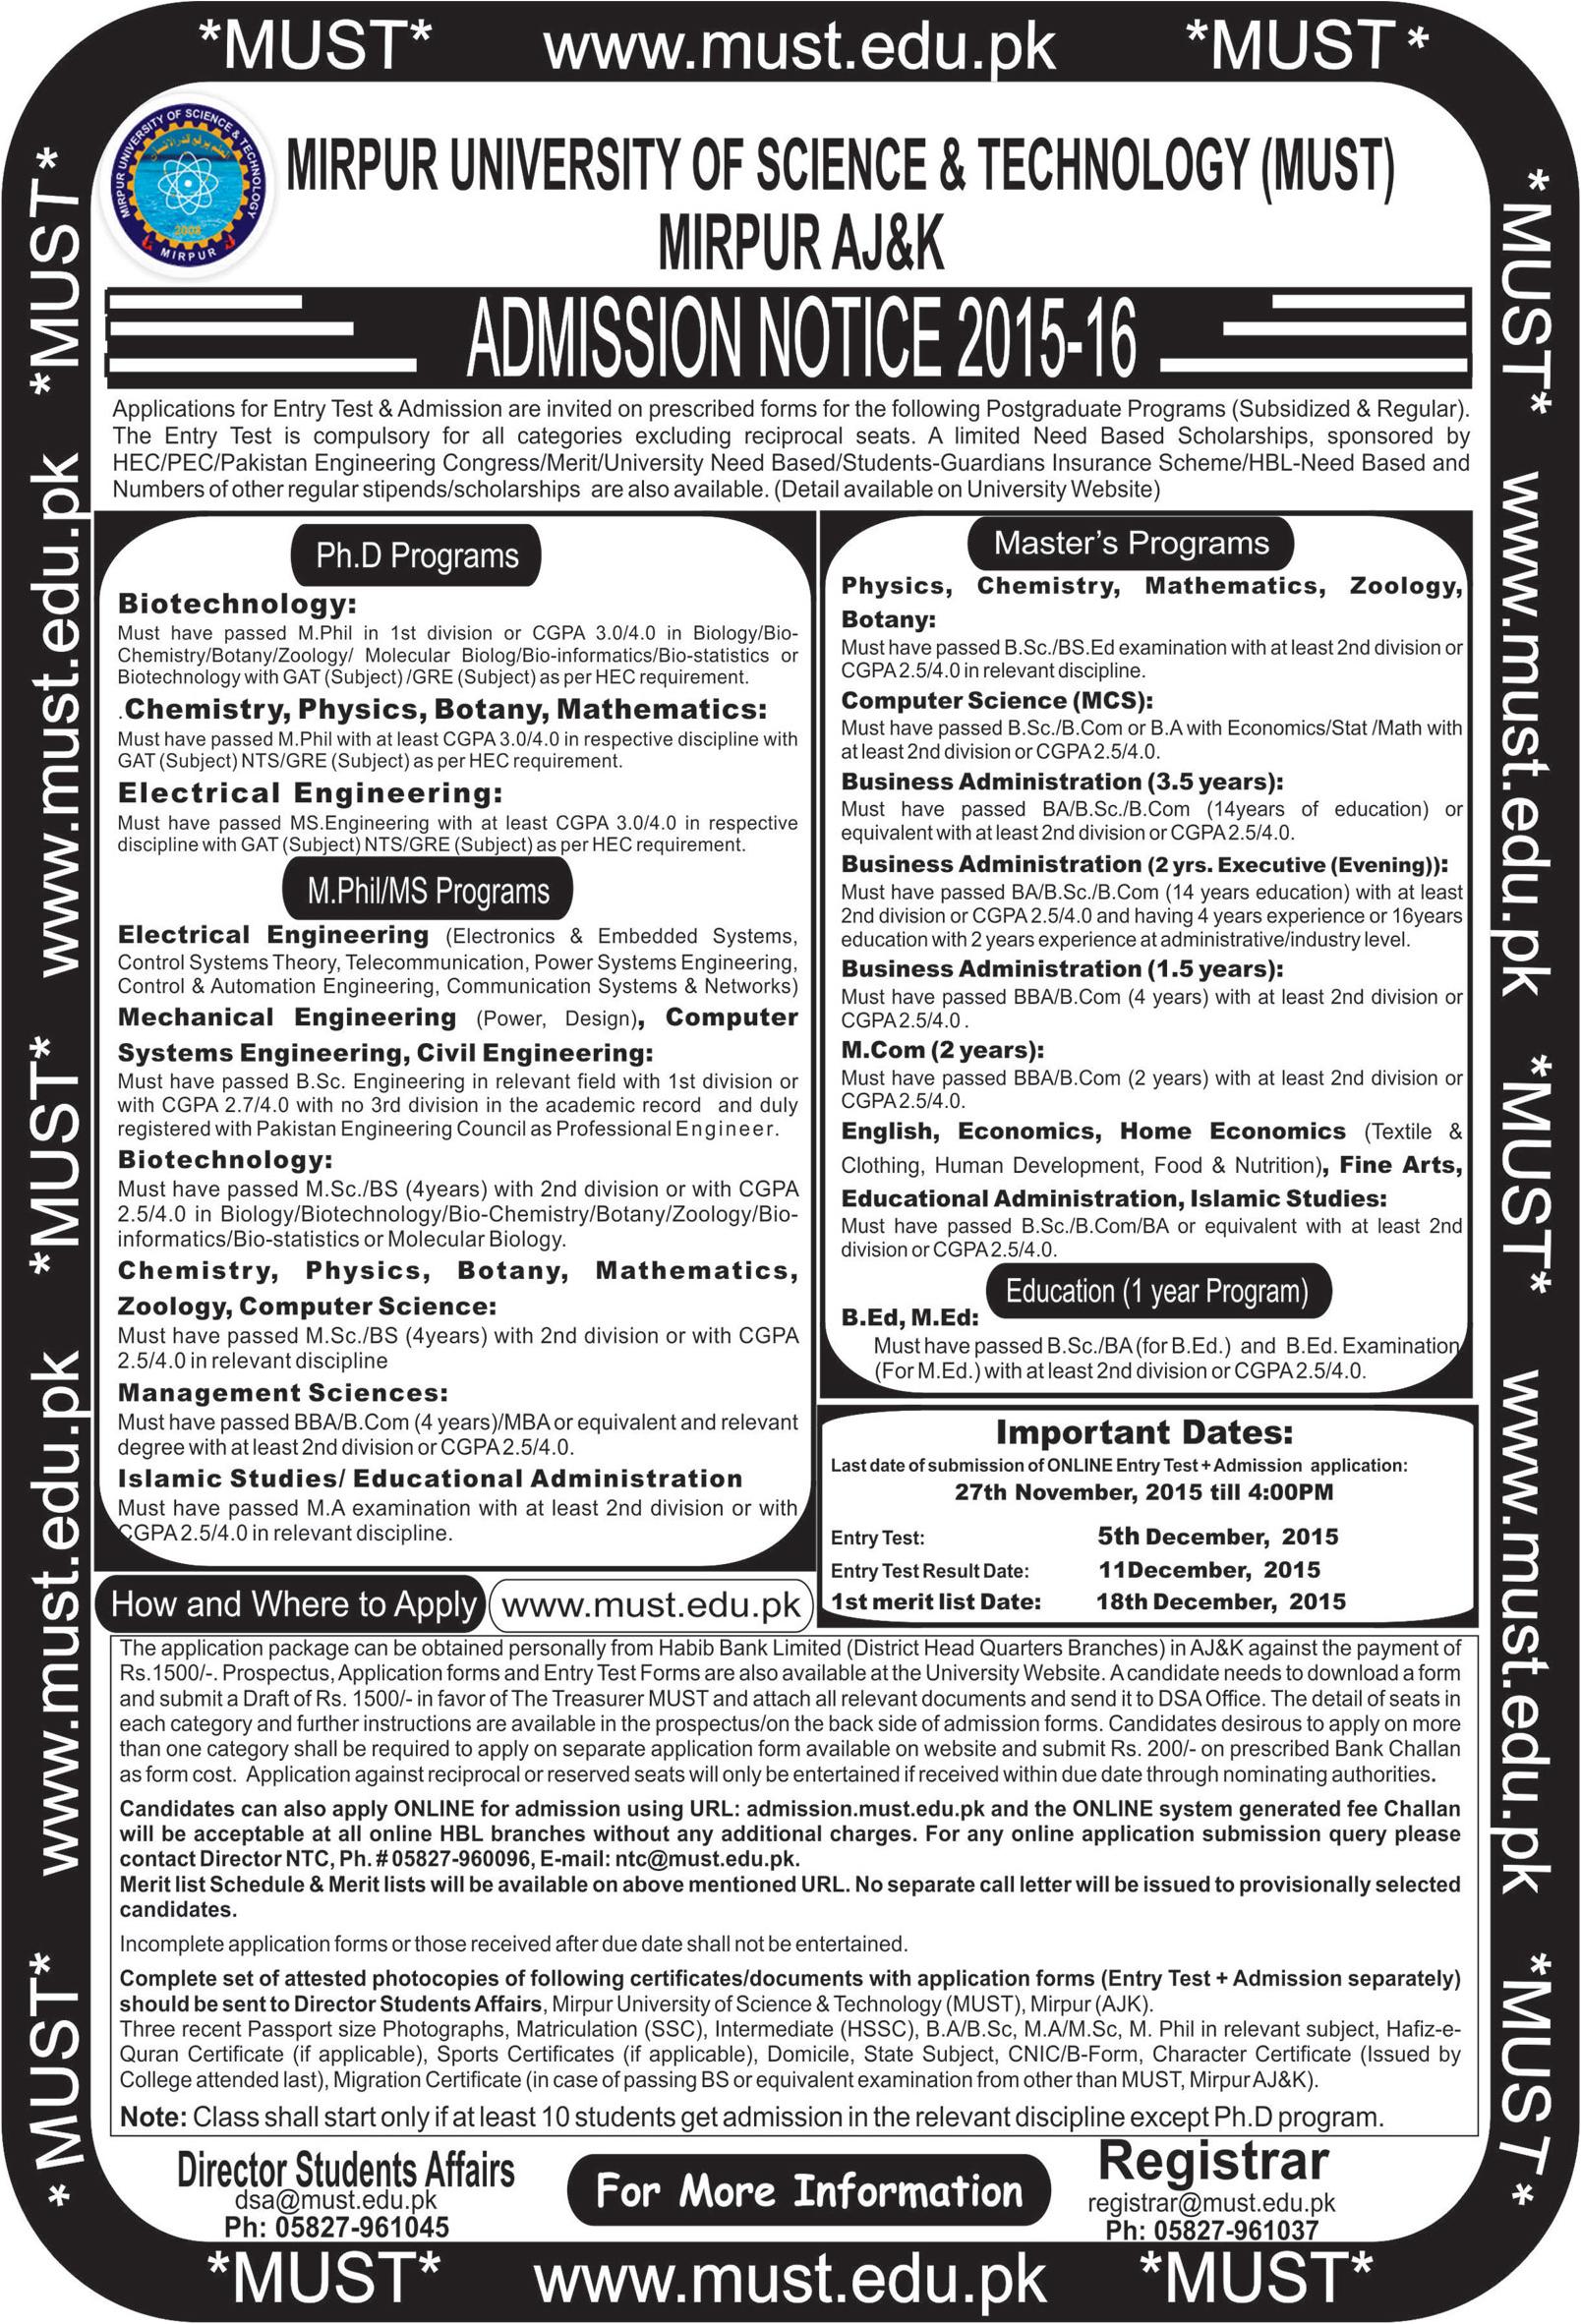 Admissions In University Of Science & Technology Mirpur Aj&k 18 - Nov - 2015